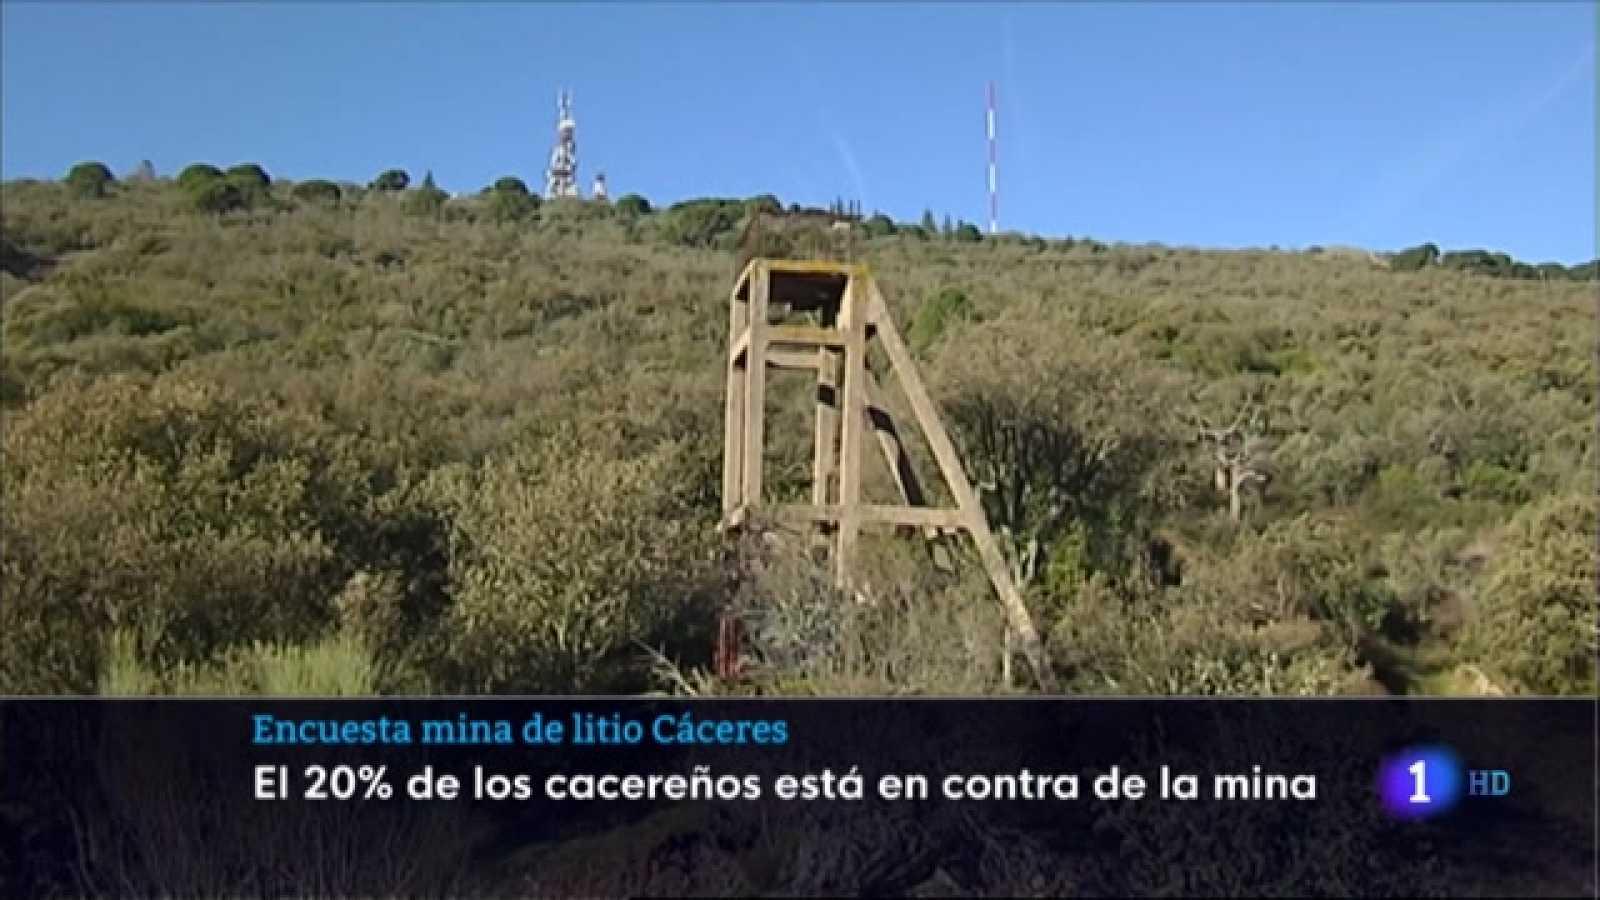 Encuesta mina de litio Cáceres - 07/04/2021